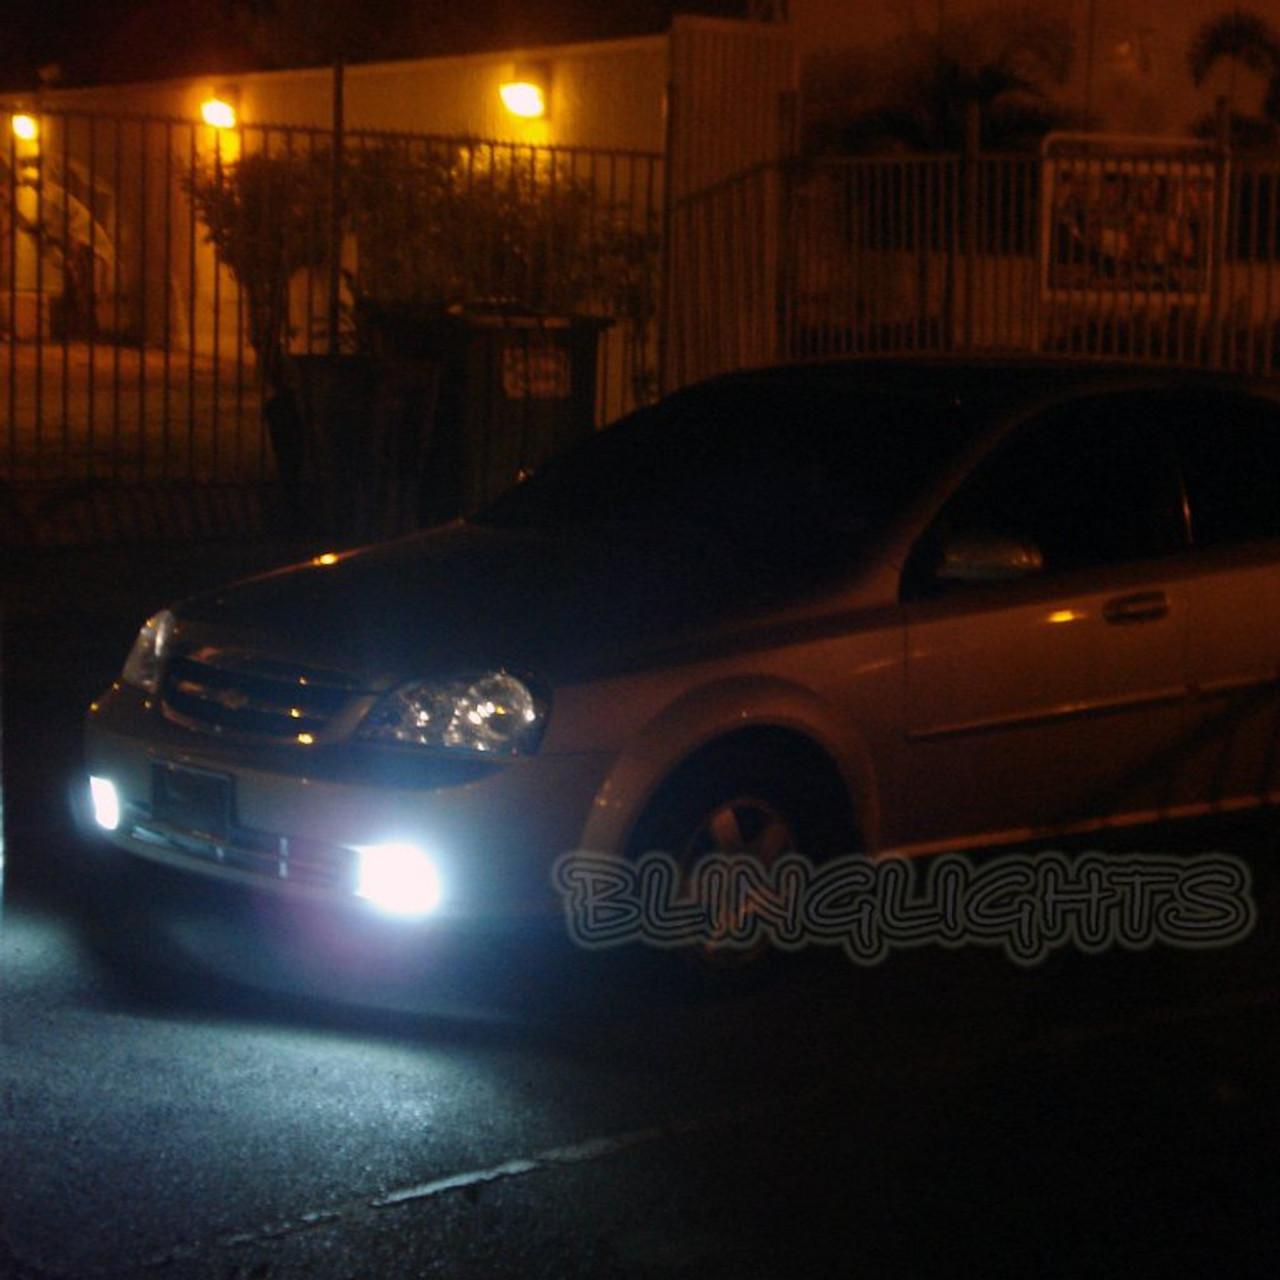 2004 2005 2006 2007 2008 Suzuki Forenza Xenon Fog Lamps Driving Lights Foglamps Foglights Kit